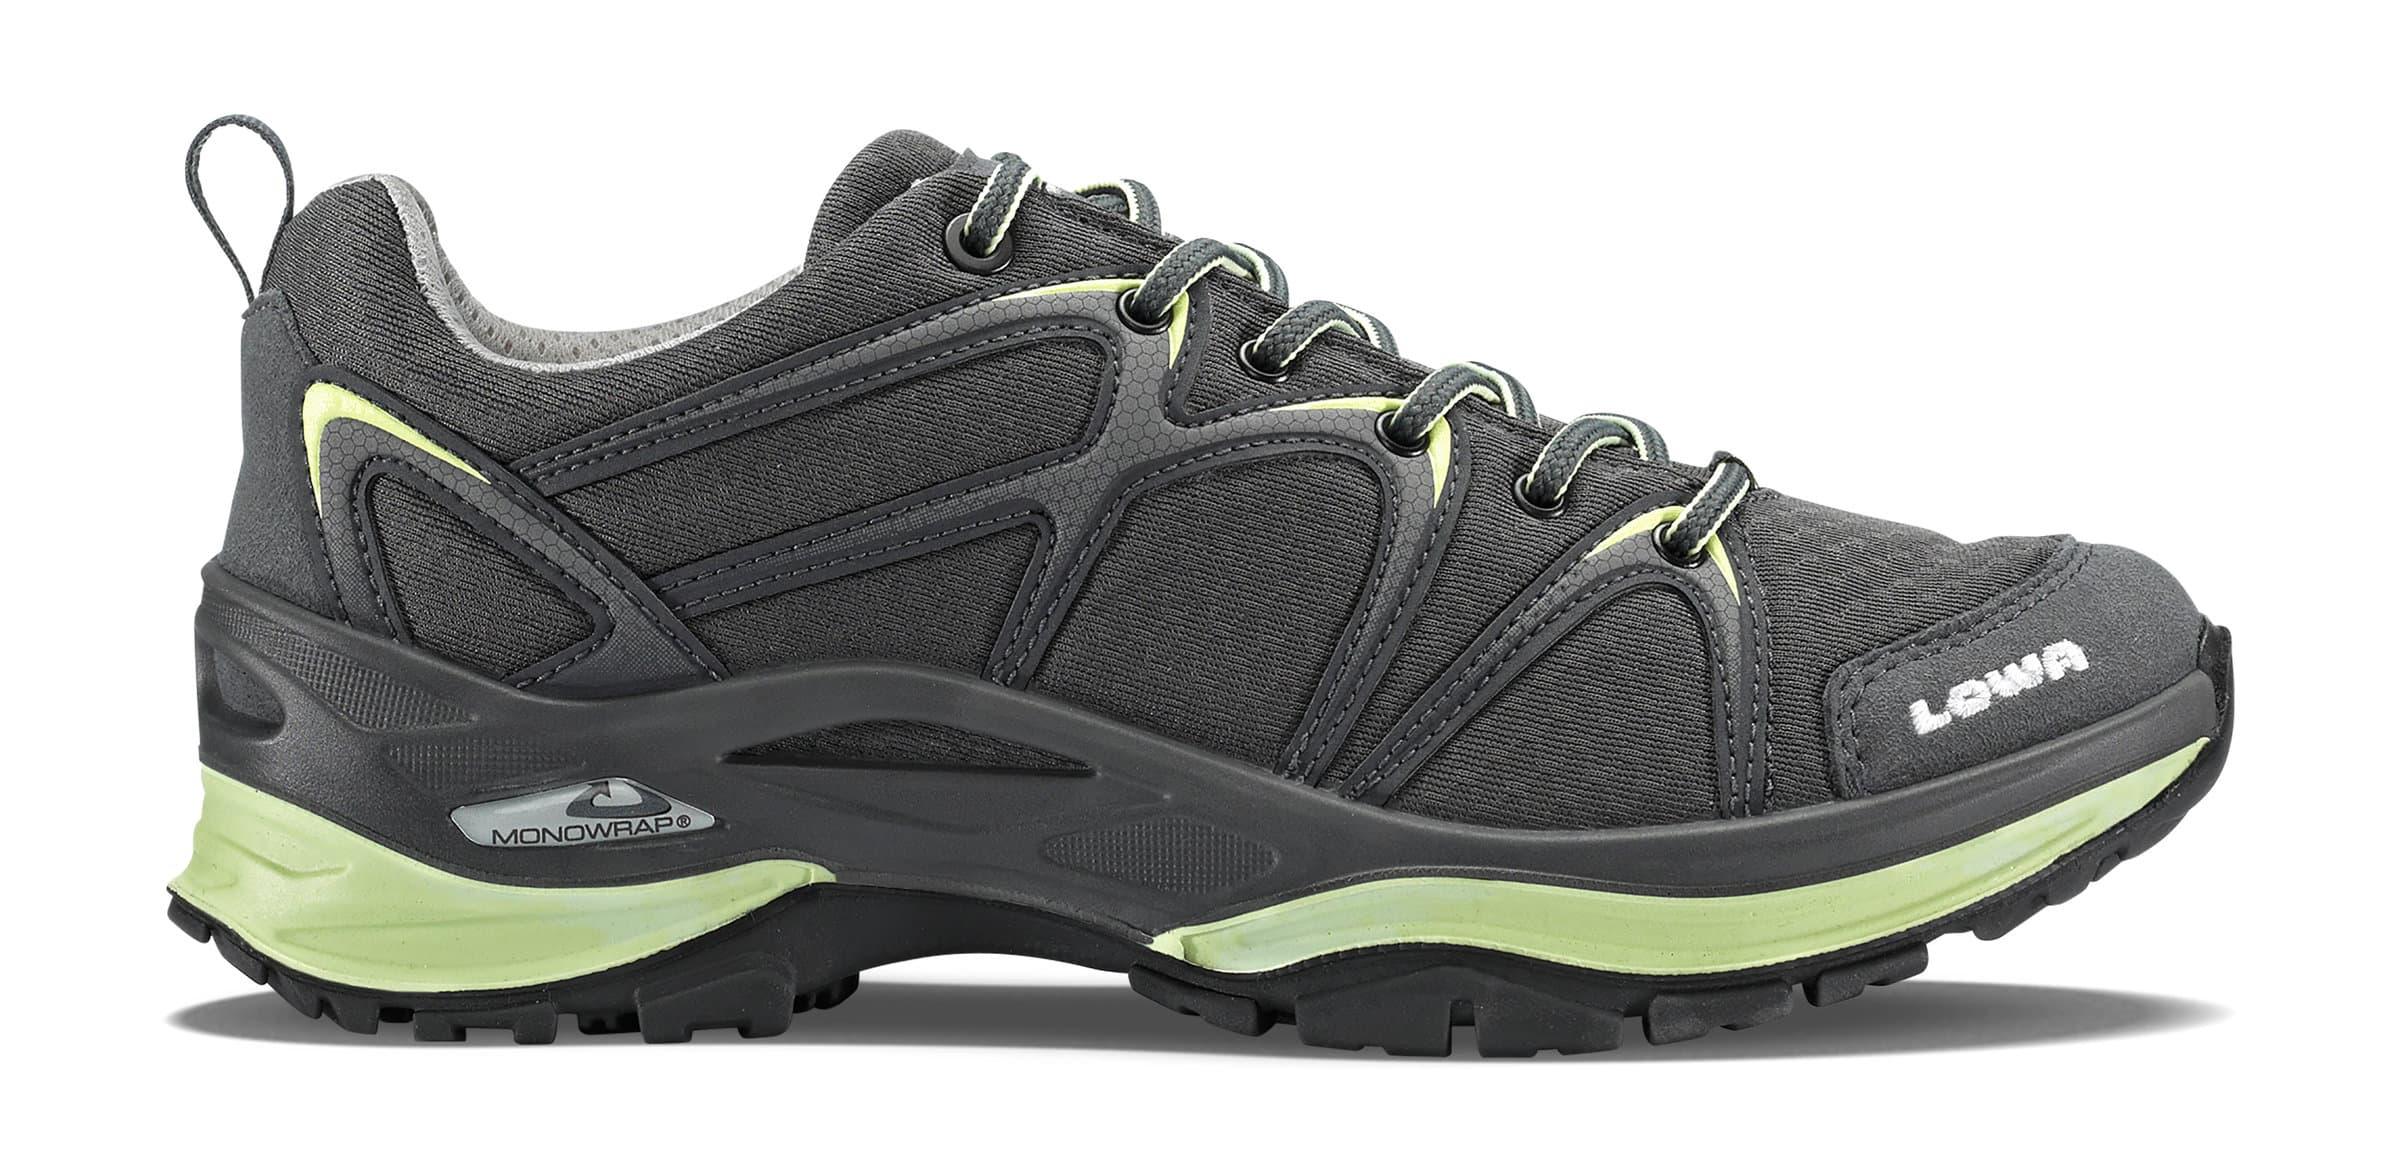 Lowa Innox GTX Lo Chaussures polyvalentes pour femme